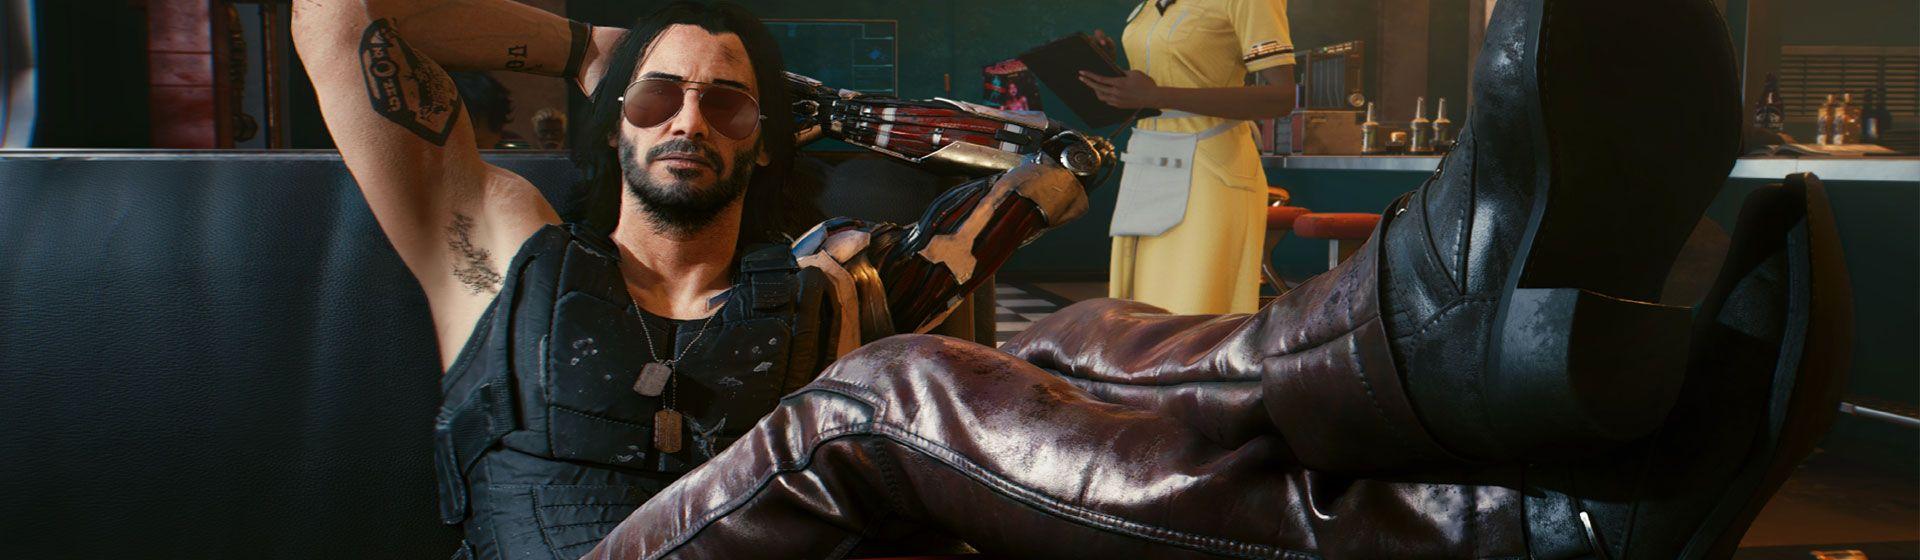 Cyberpunk 2077 recebe trailer com Keanu Reeves e gameplay inédita